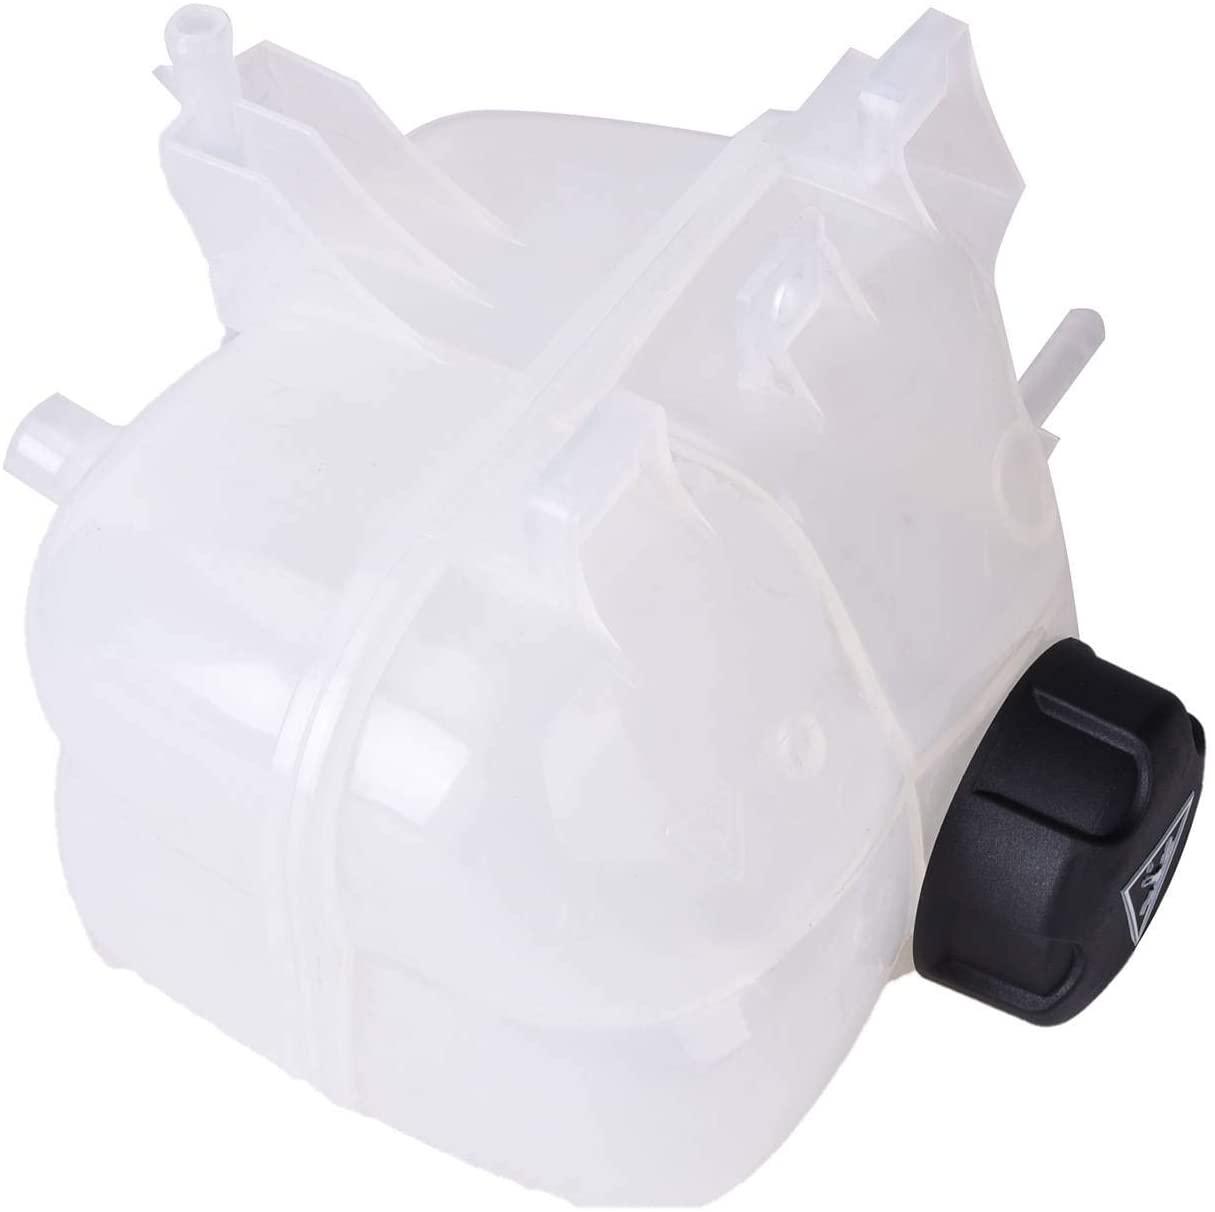 TOPAZ 17137823626 Coolant Reservoir Overflow Expansion Tank w/Cap for BMW Mini Cooper Countryman Paceman R56 R60 I01 i3